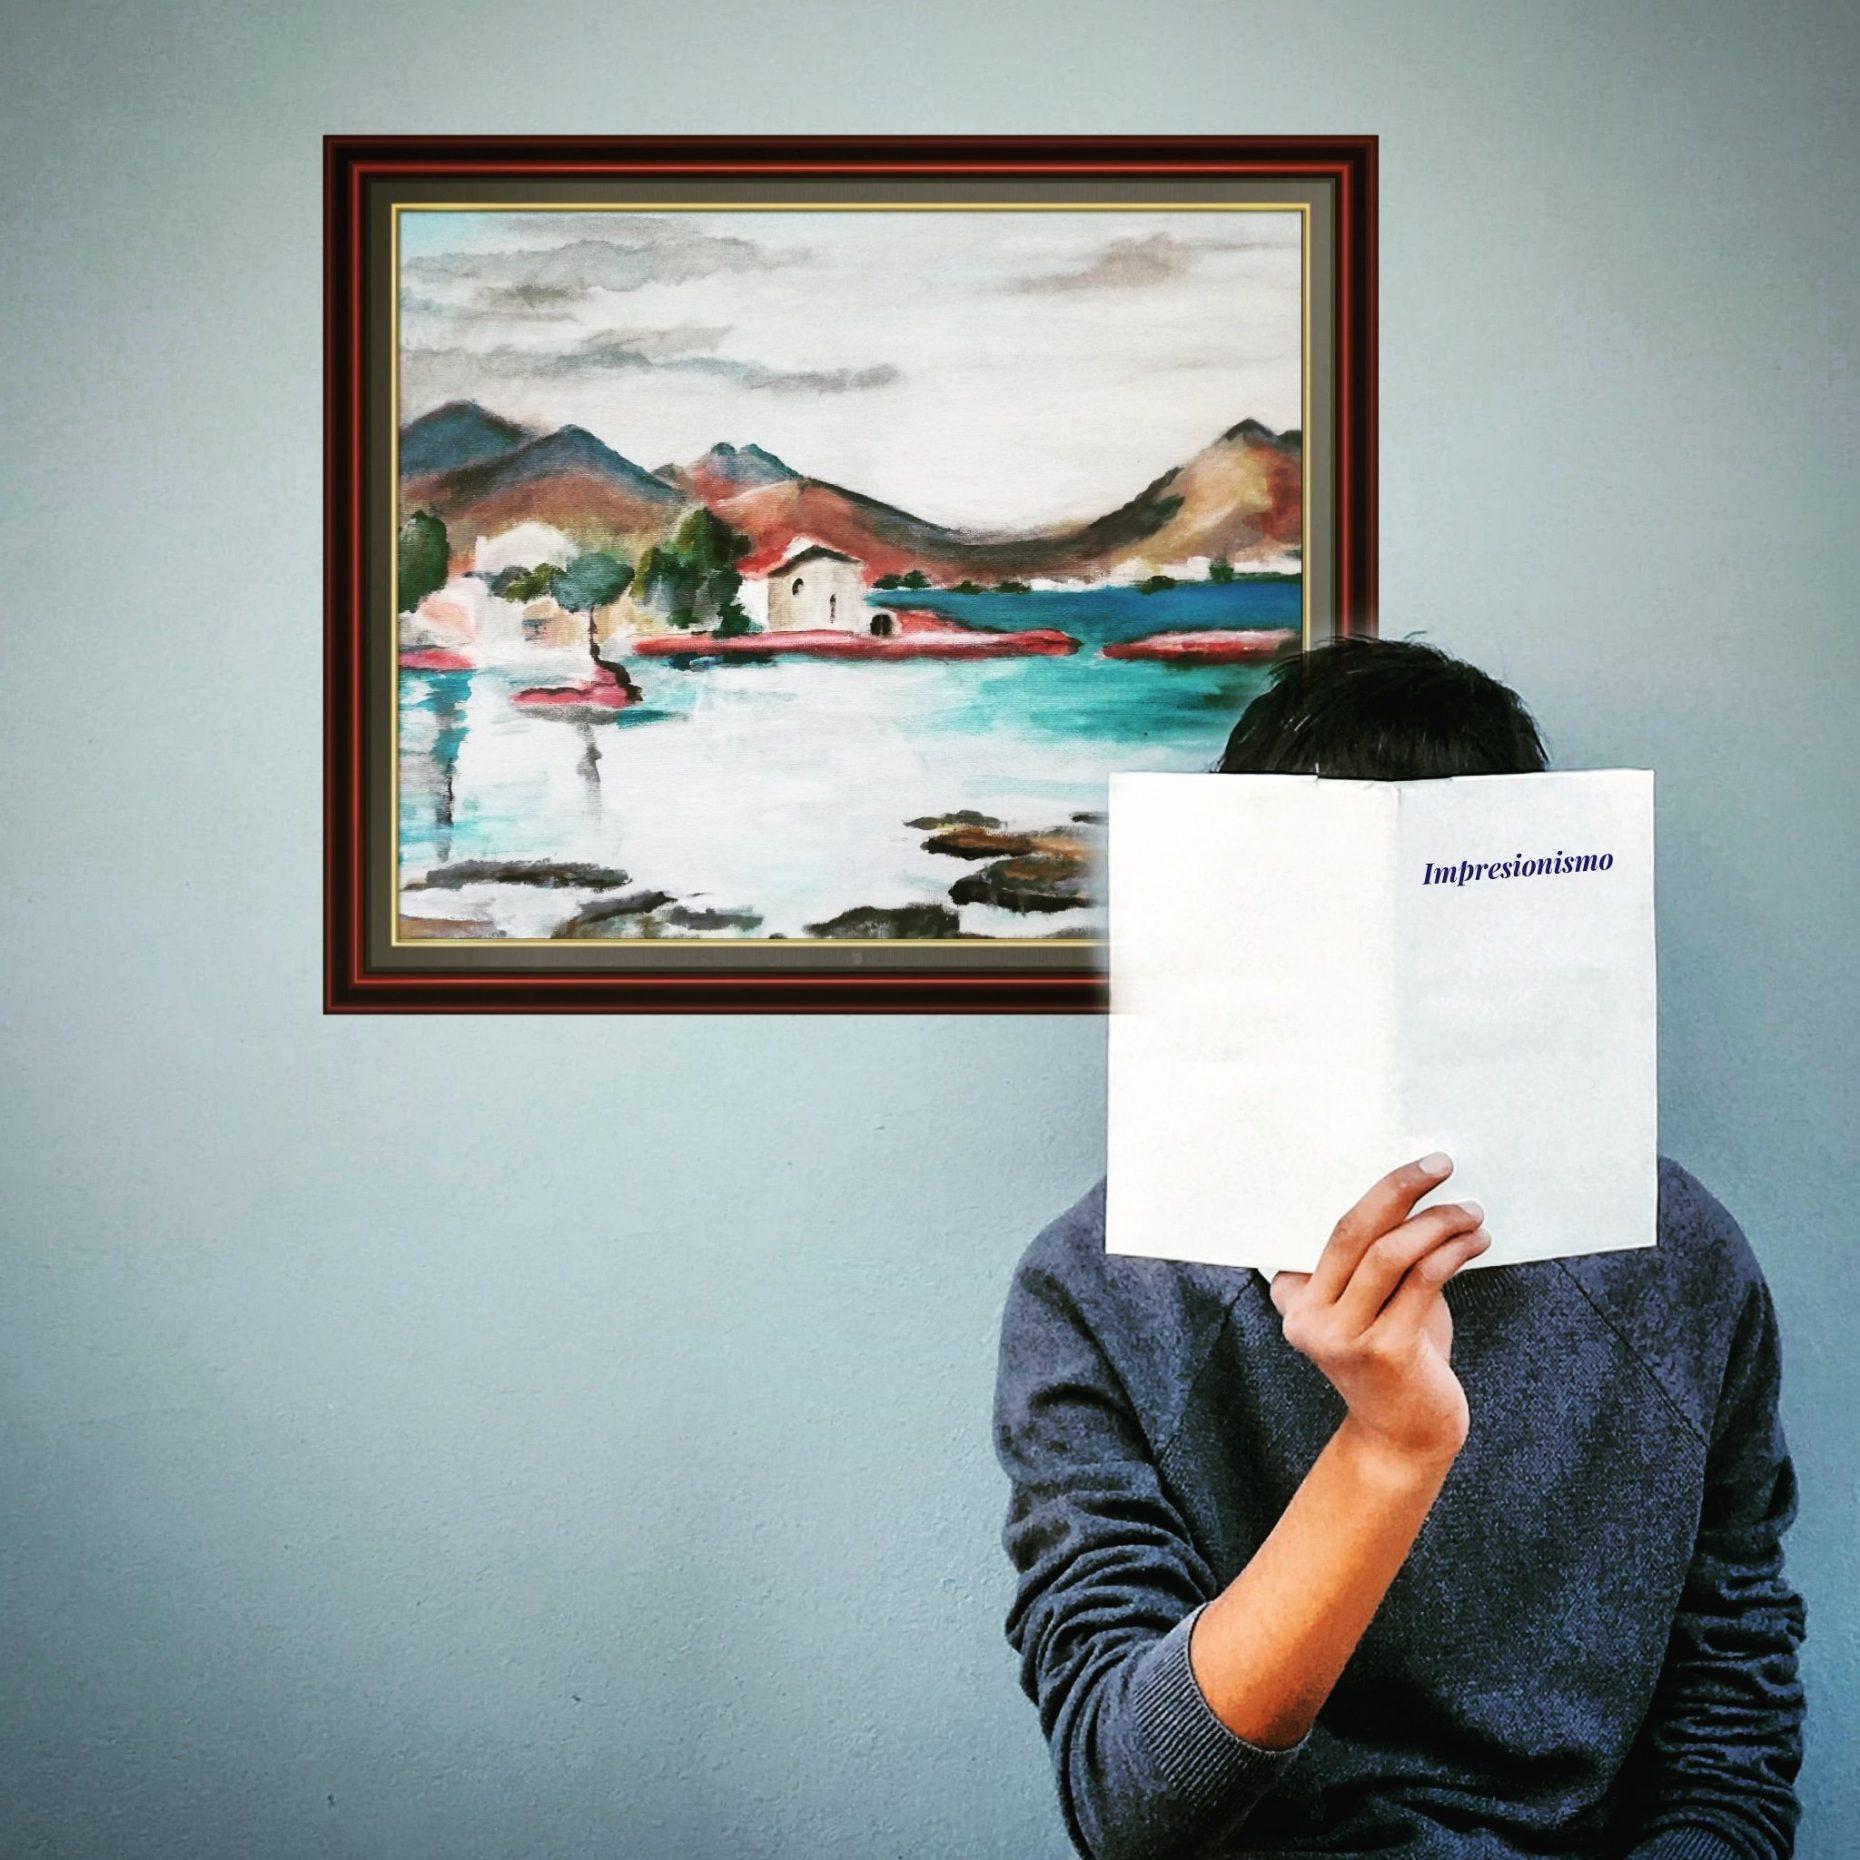 Paisaje, portrait, sea, scenery, pueblo, costa, coast, town, impressionist, impresionismo